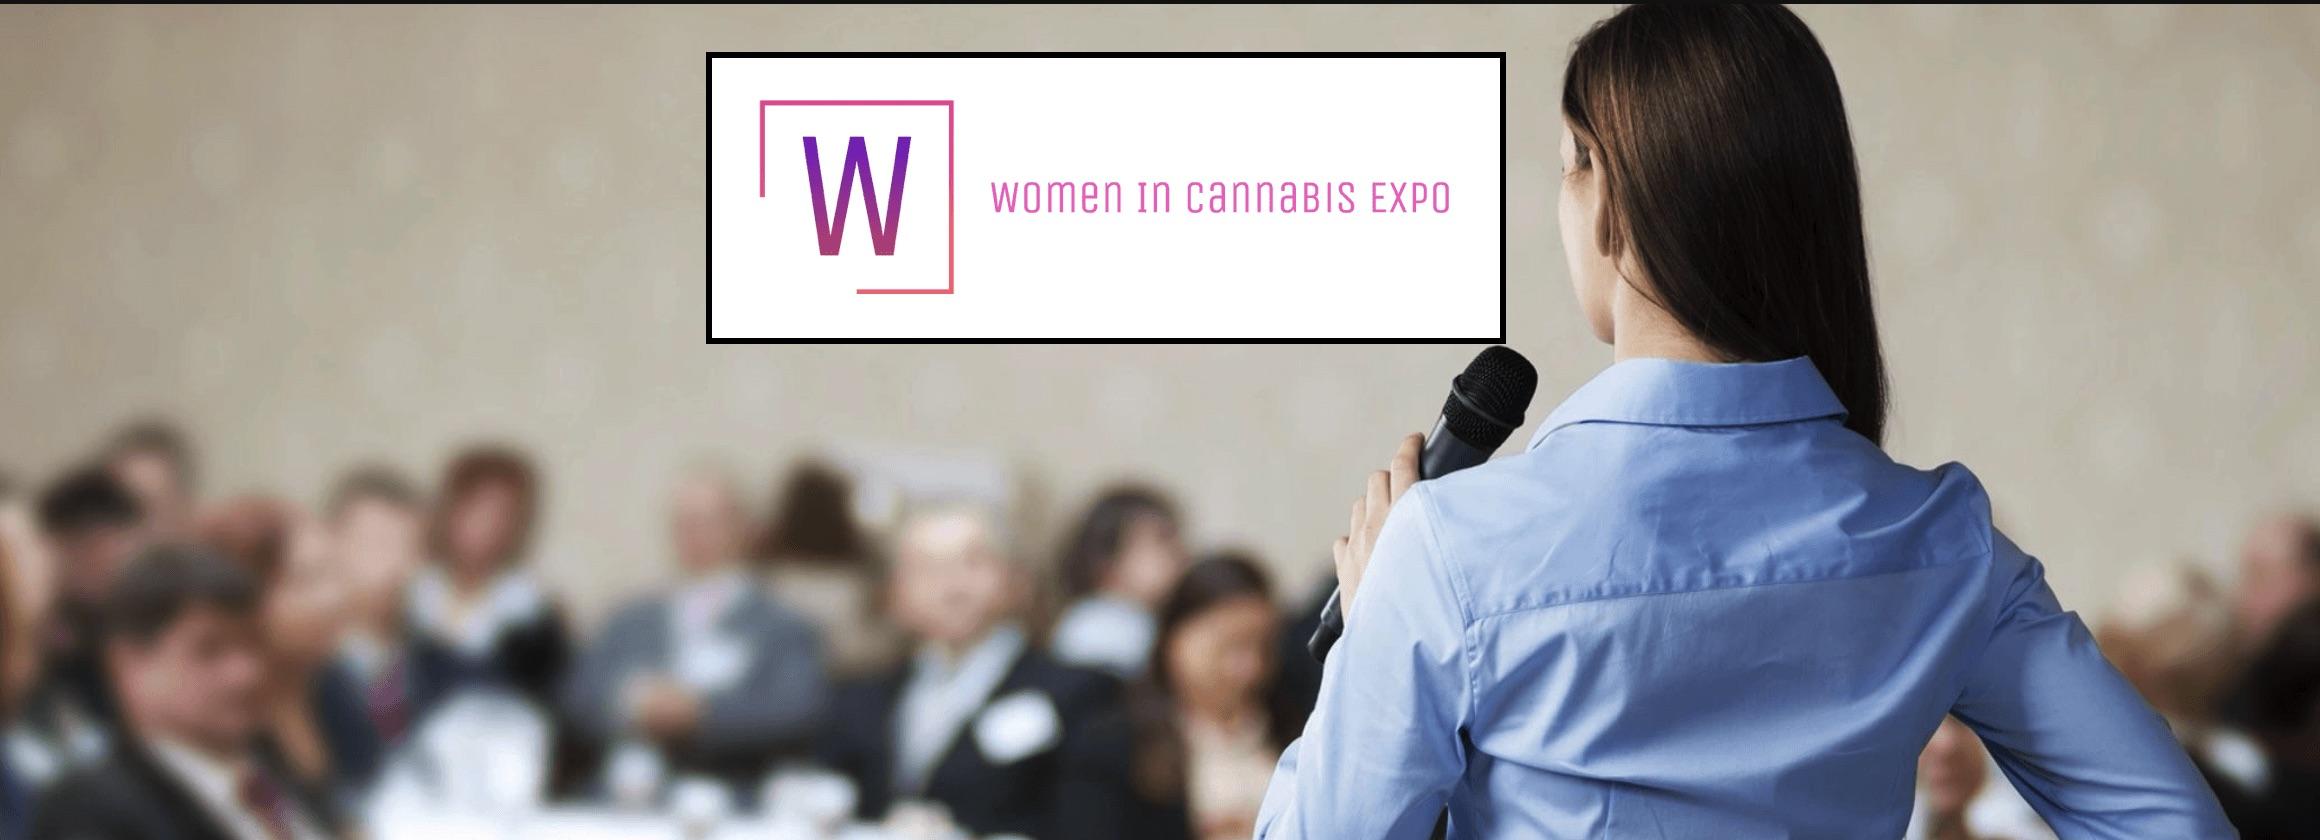 Women in Cannabis Expo (Sponsorship)